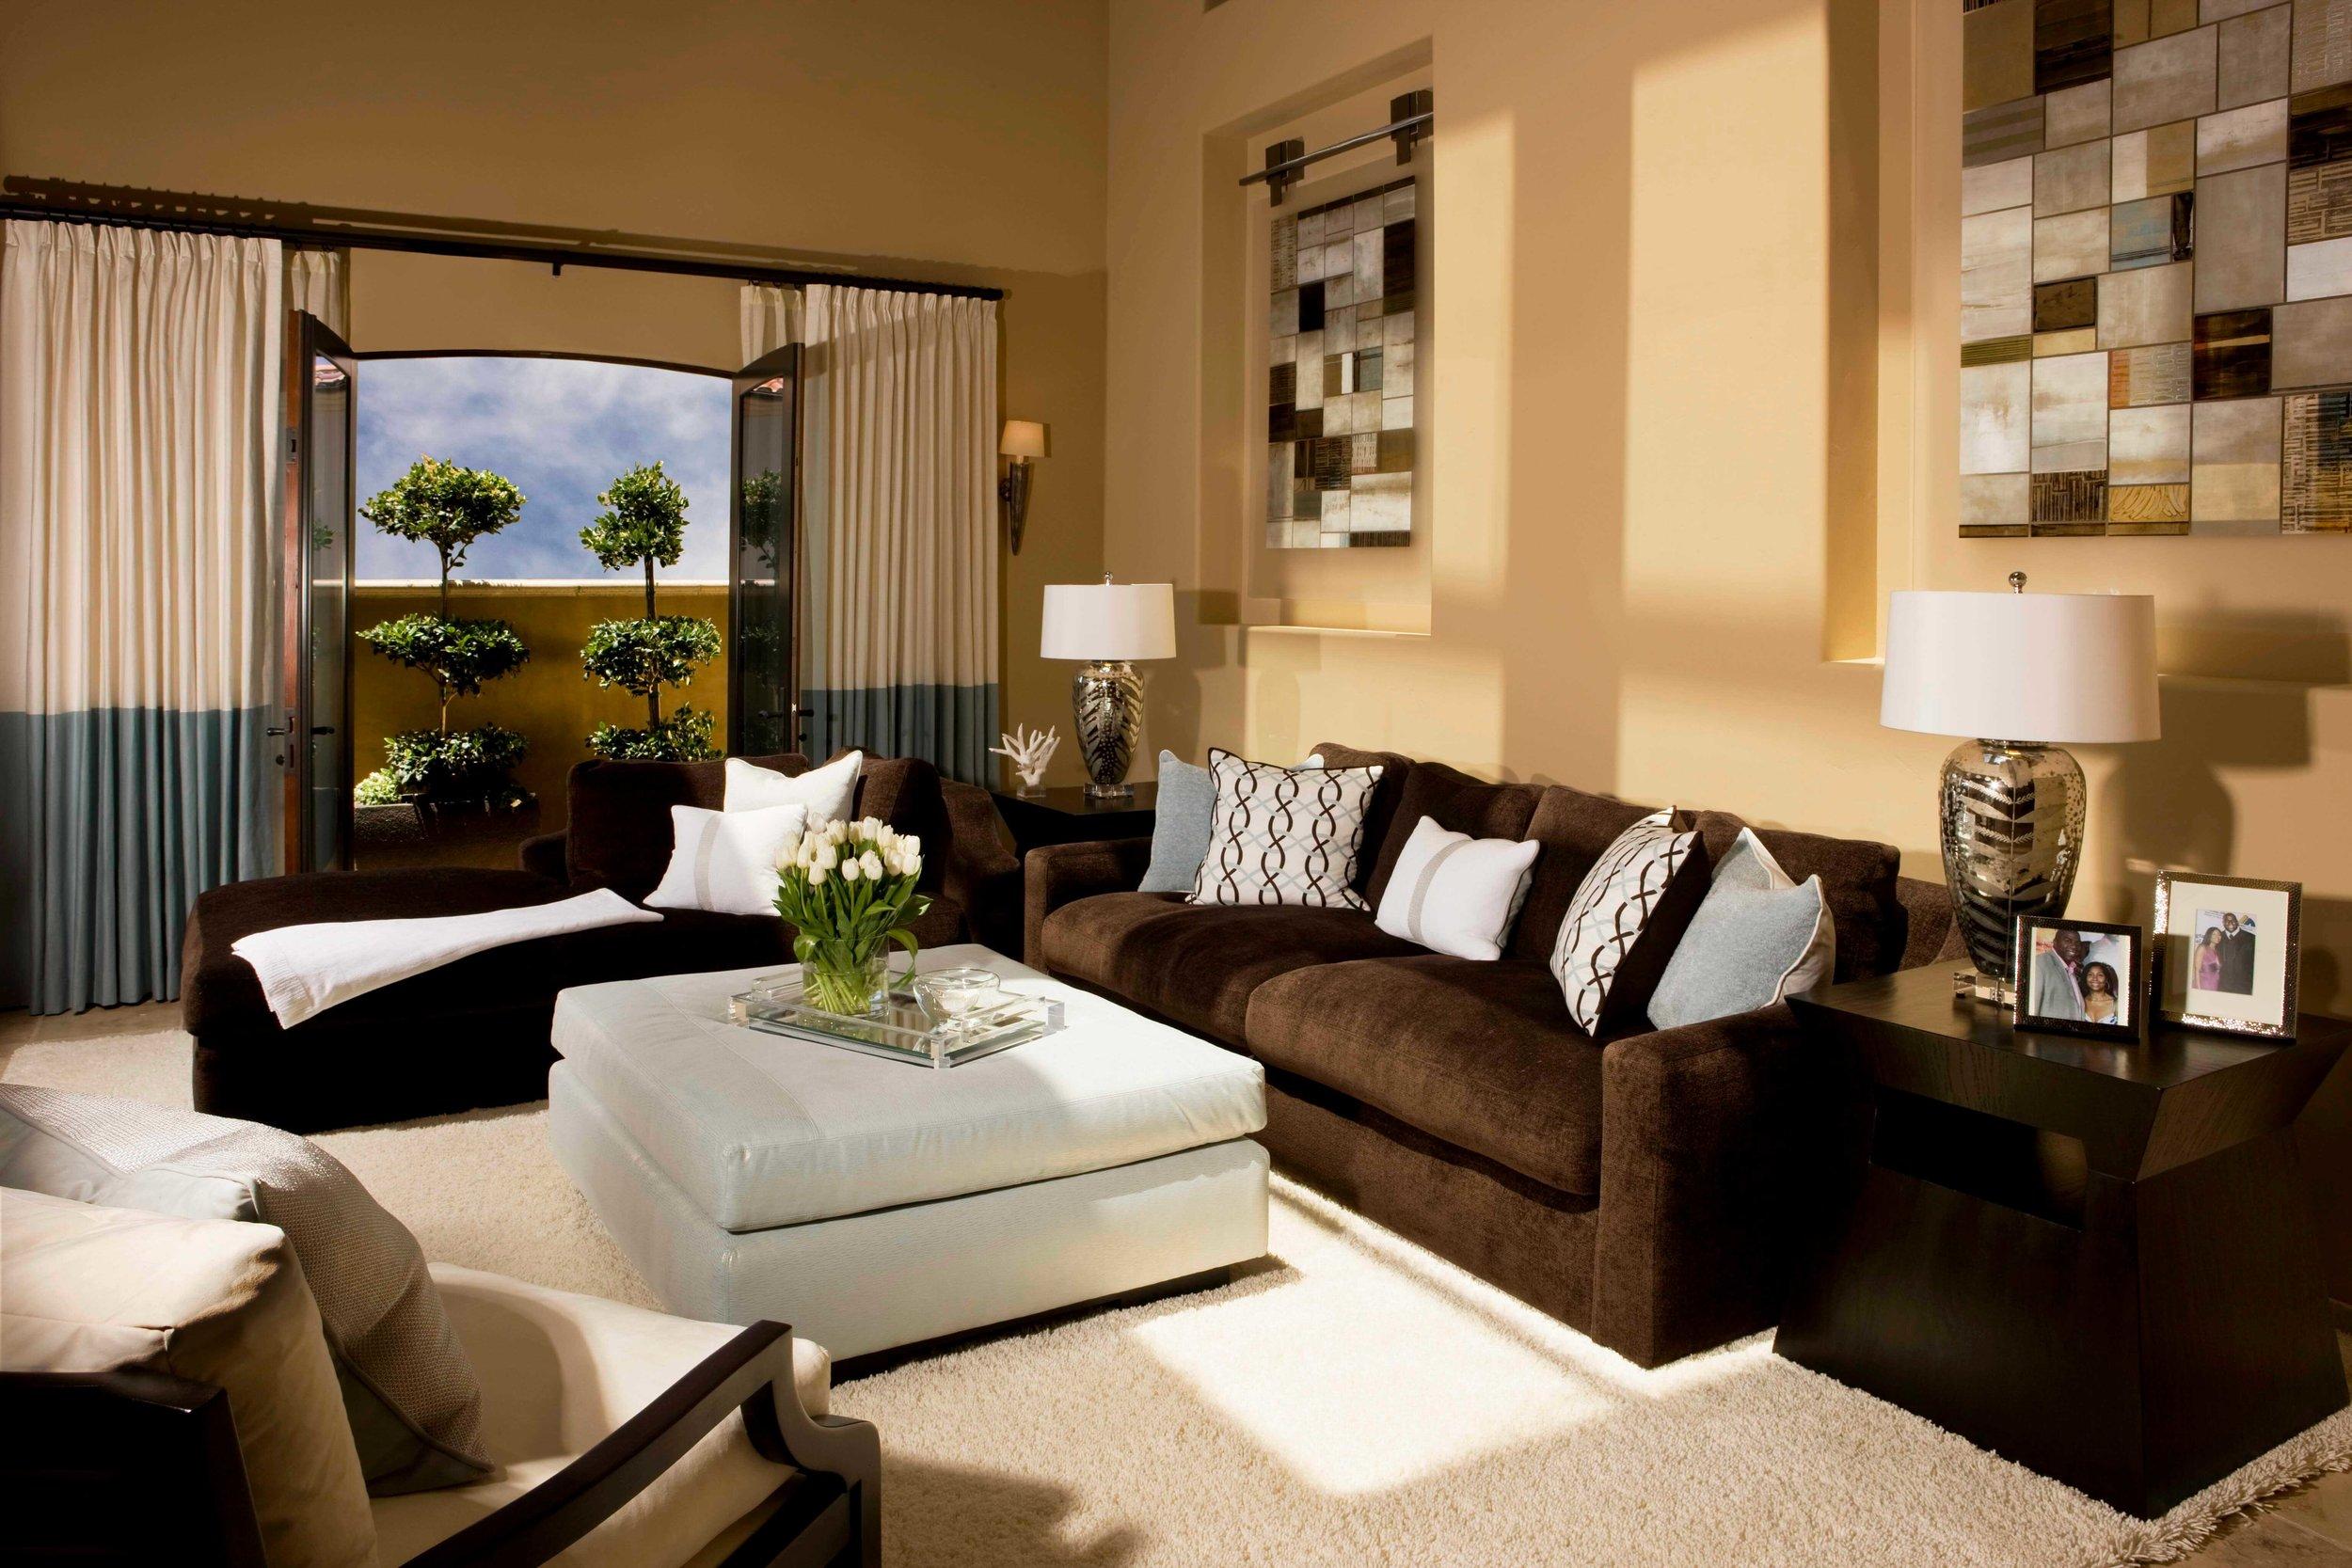 elizabeth-tapper-interiors-ritz-cove-laguna-formal-living-room-sitting-room.jpg